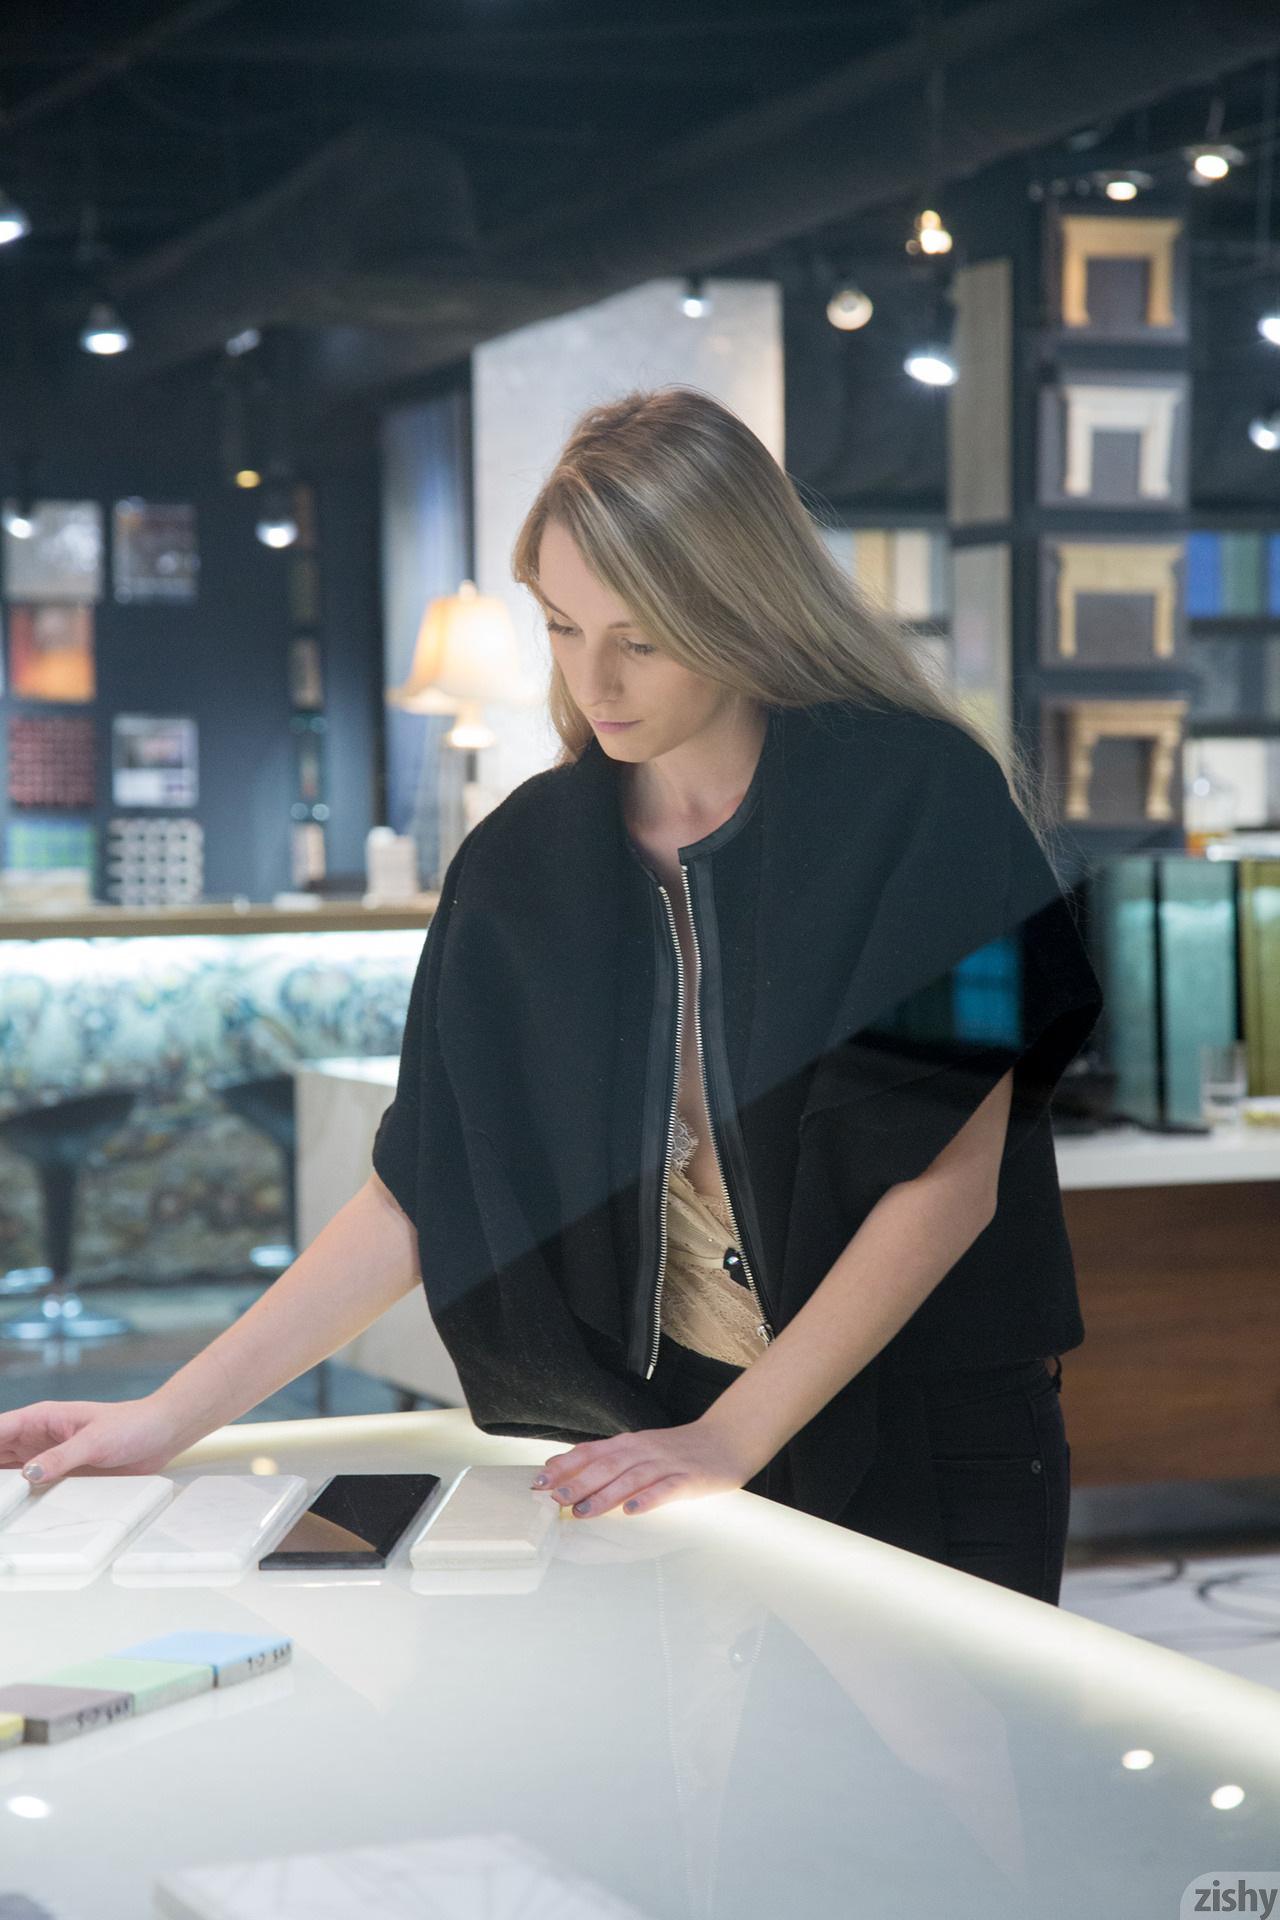 Women Payton Demilo Blonde Zishy Jacket Black Clothing Black Clothes 1280x1920 Wallpaper Wallhaven Cc